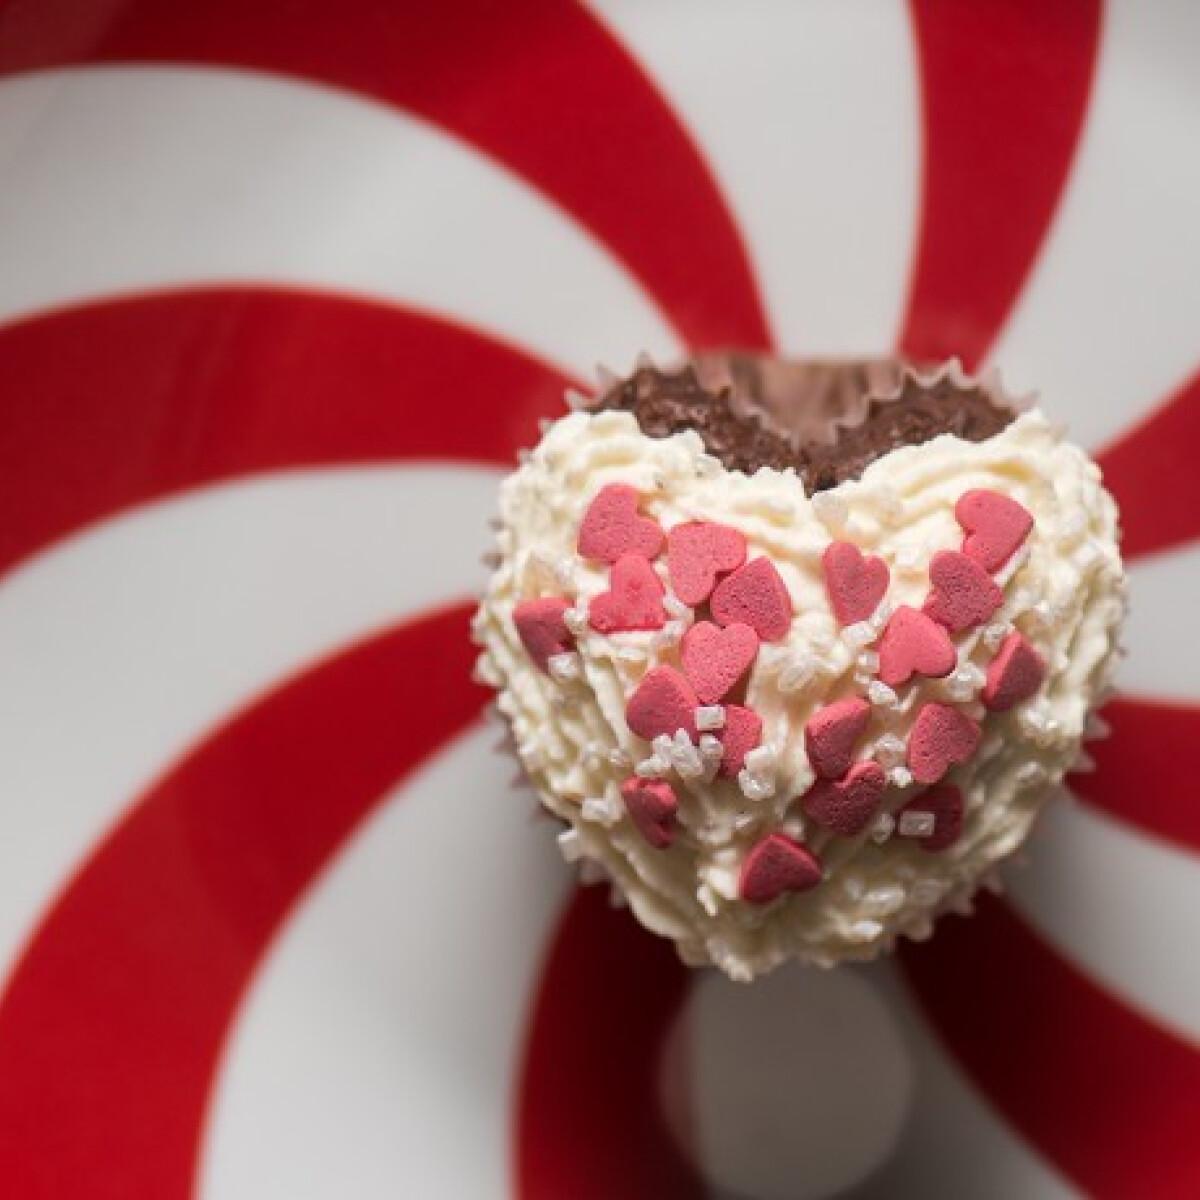 Ezen a képen: Szívalakú muffin